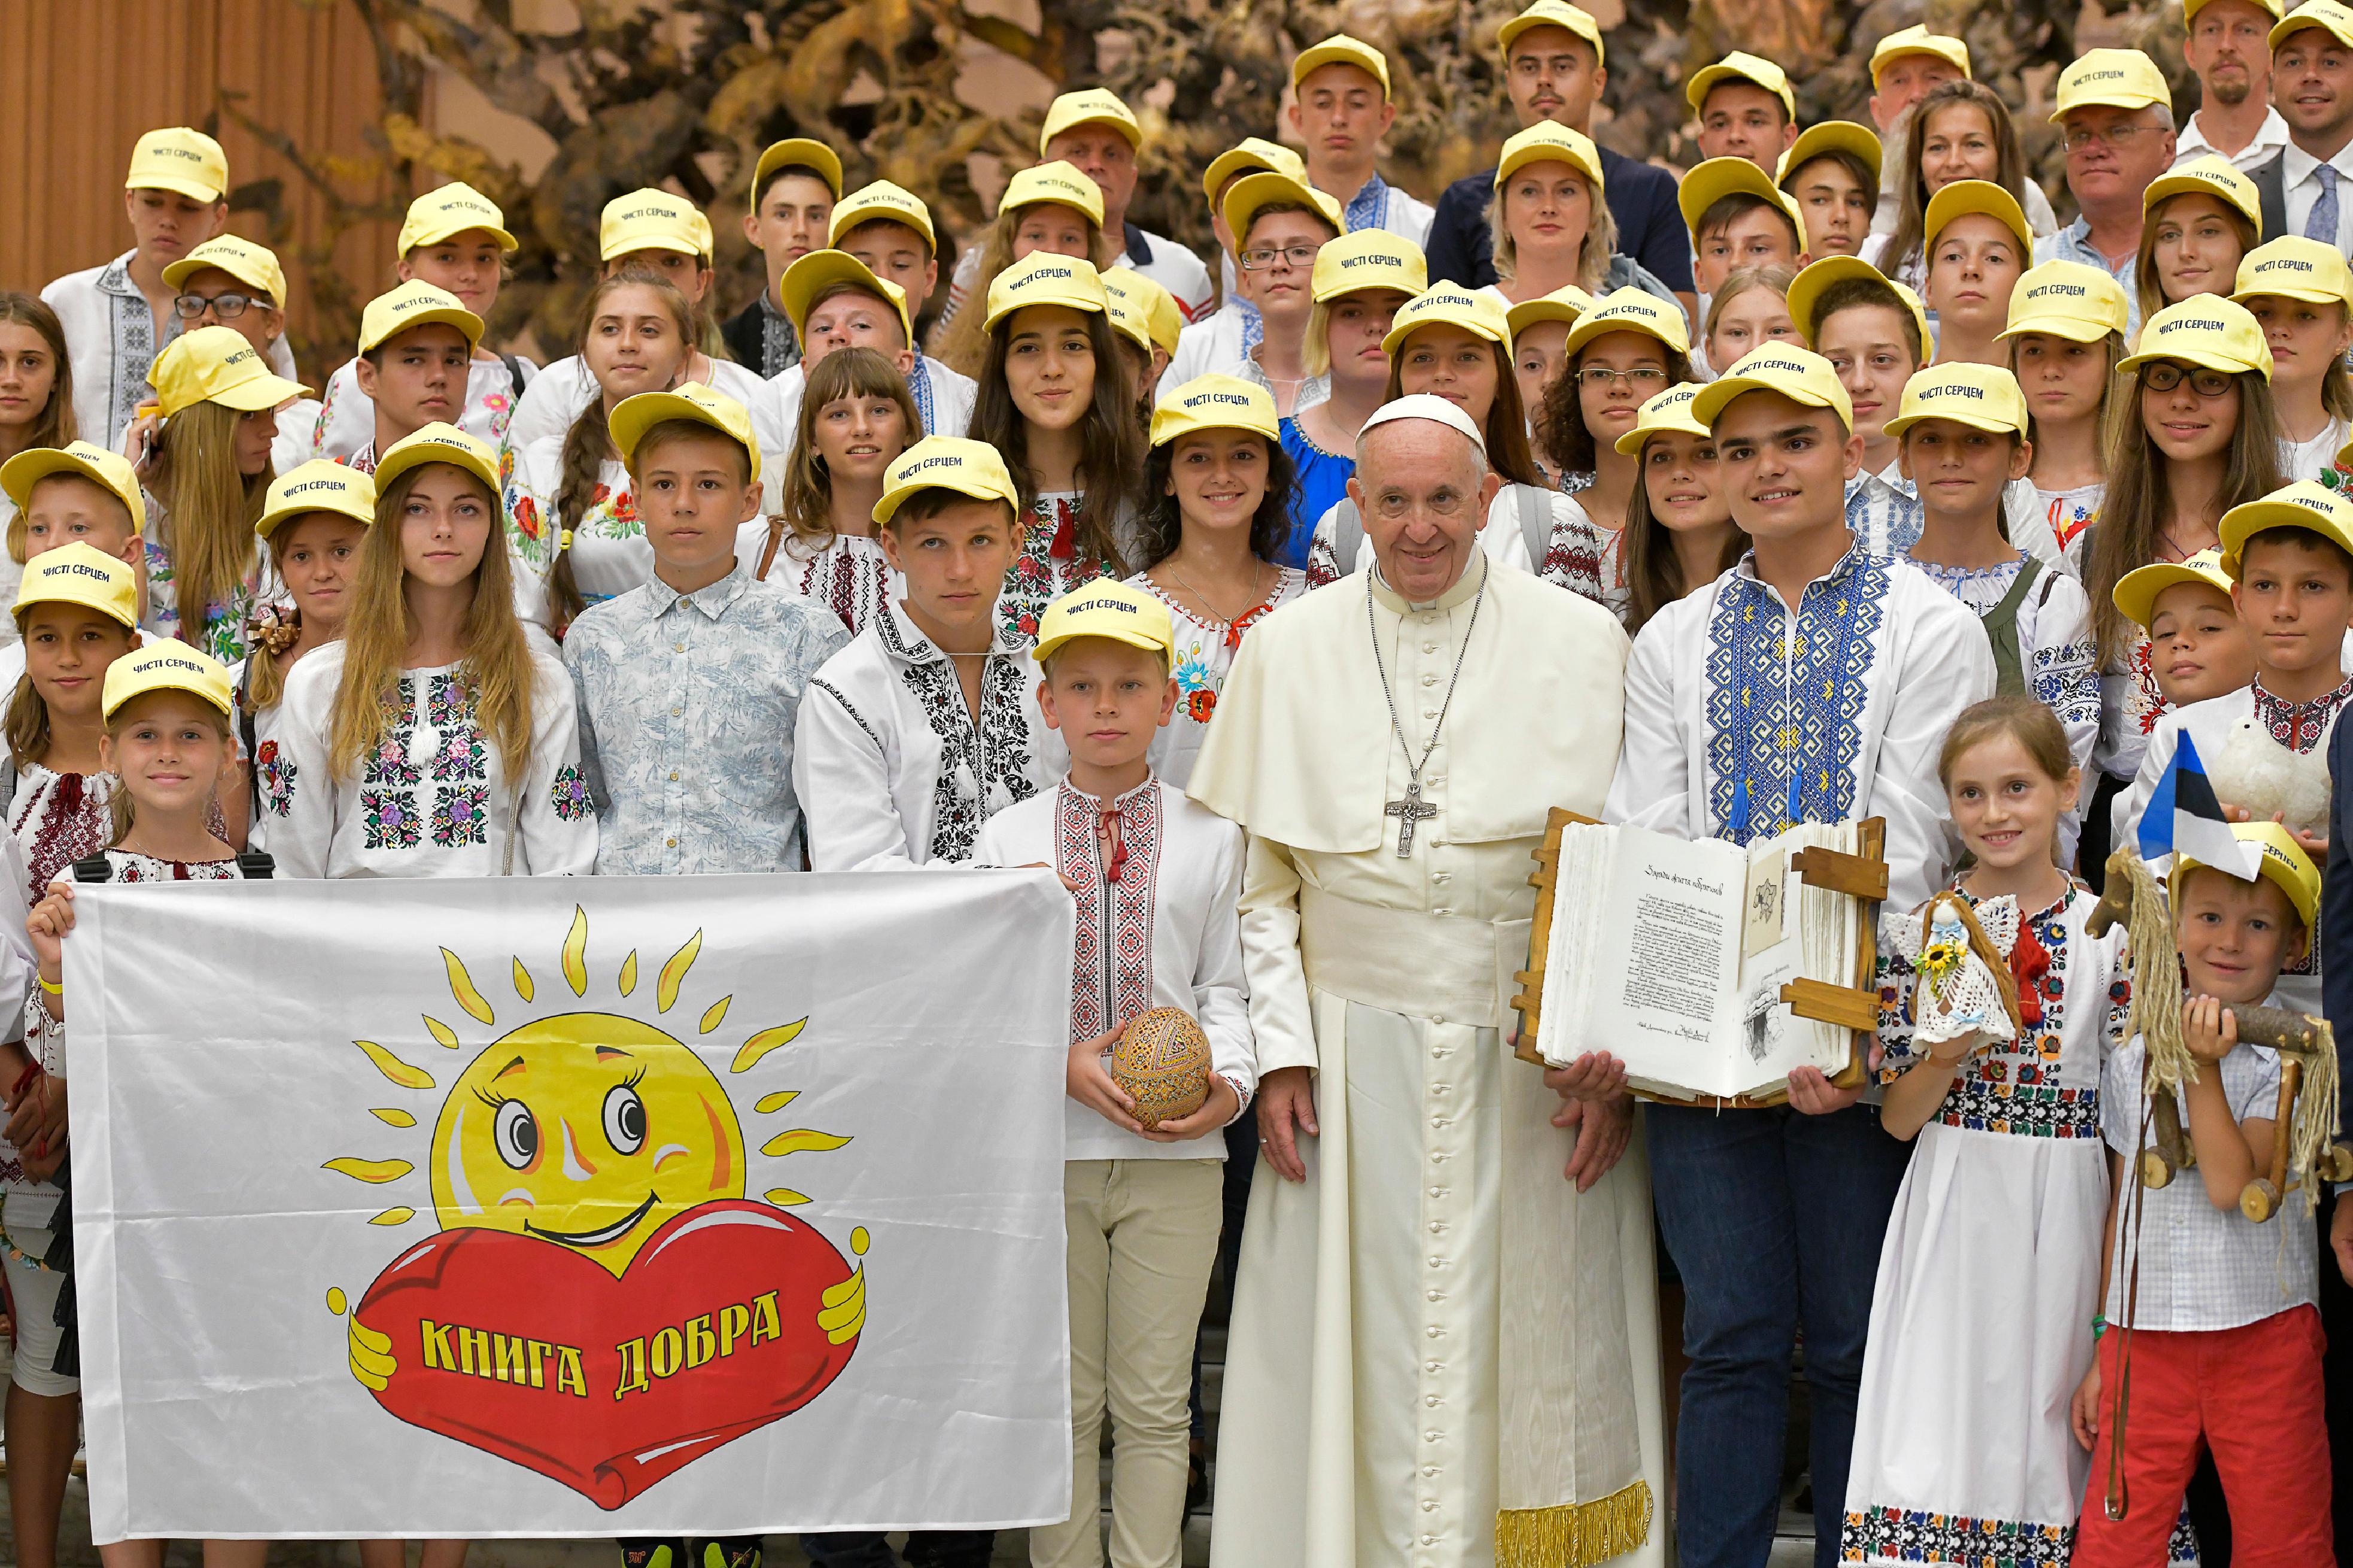 Jeunes d'Ukraine, audience du 8 août 2018 © Vatican Media